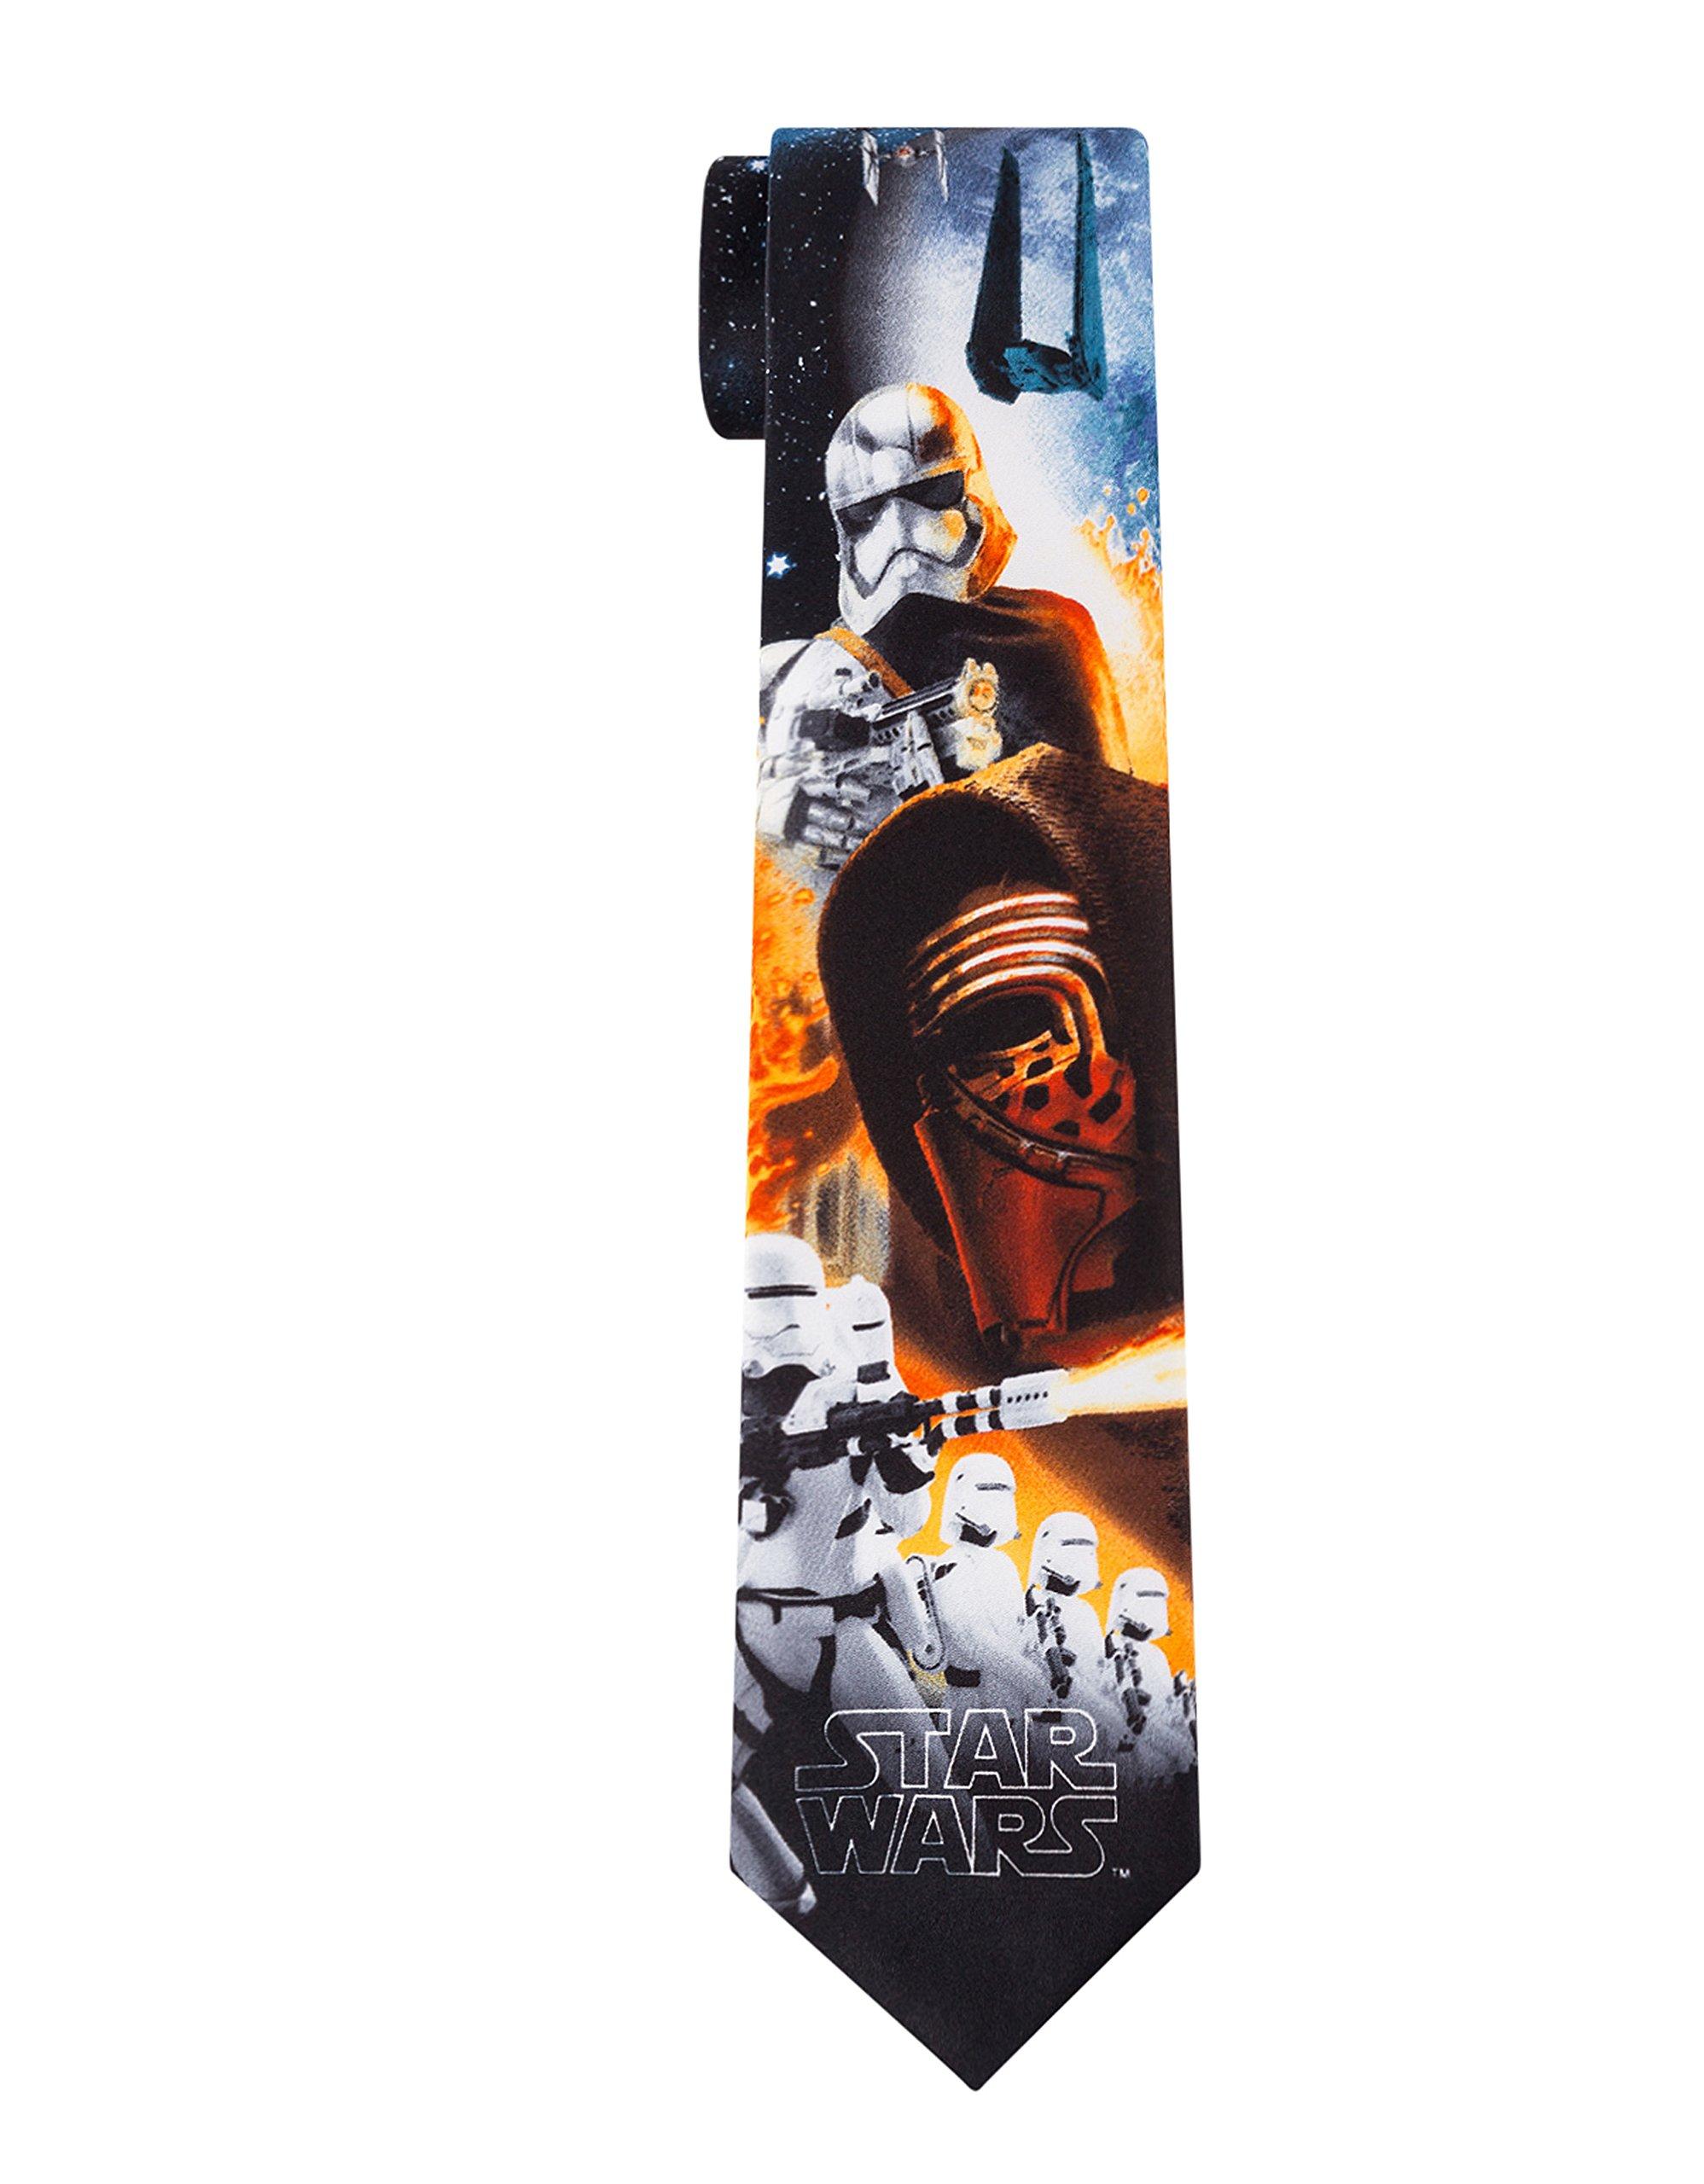 Star Wars Big Boys The Force Awakens Ties (Various Patterns), Kylo Black, One Size